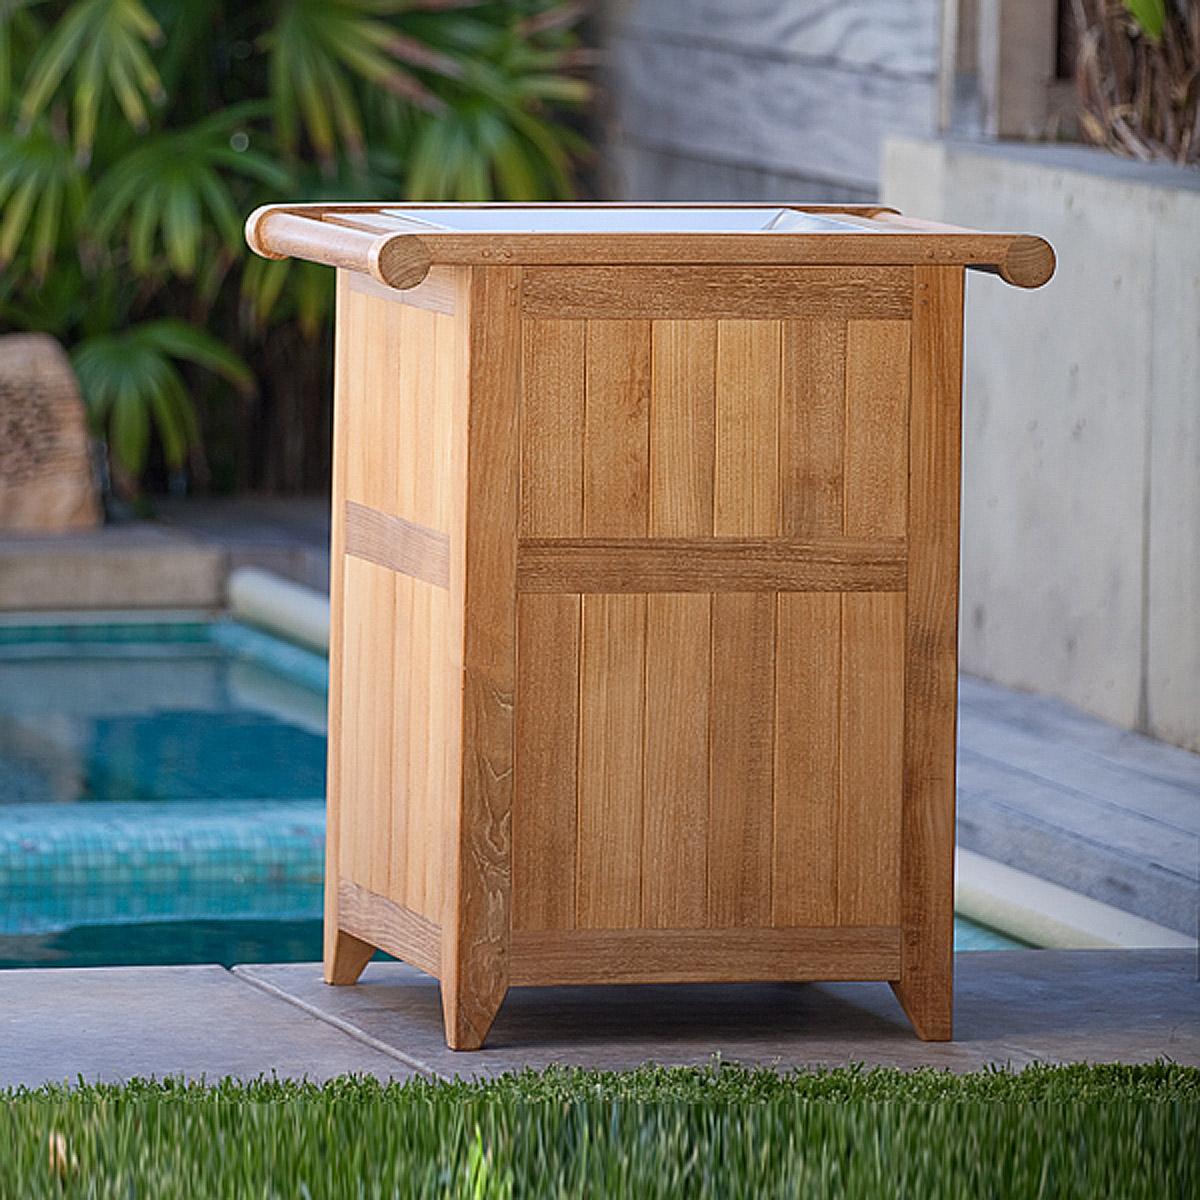 Teak Outdoor Trash Receptacle And Towel Hamper